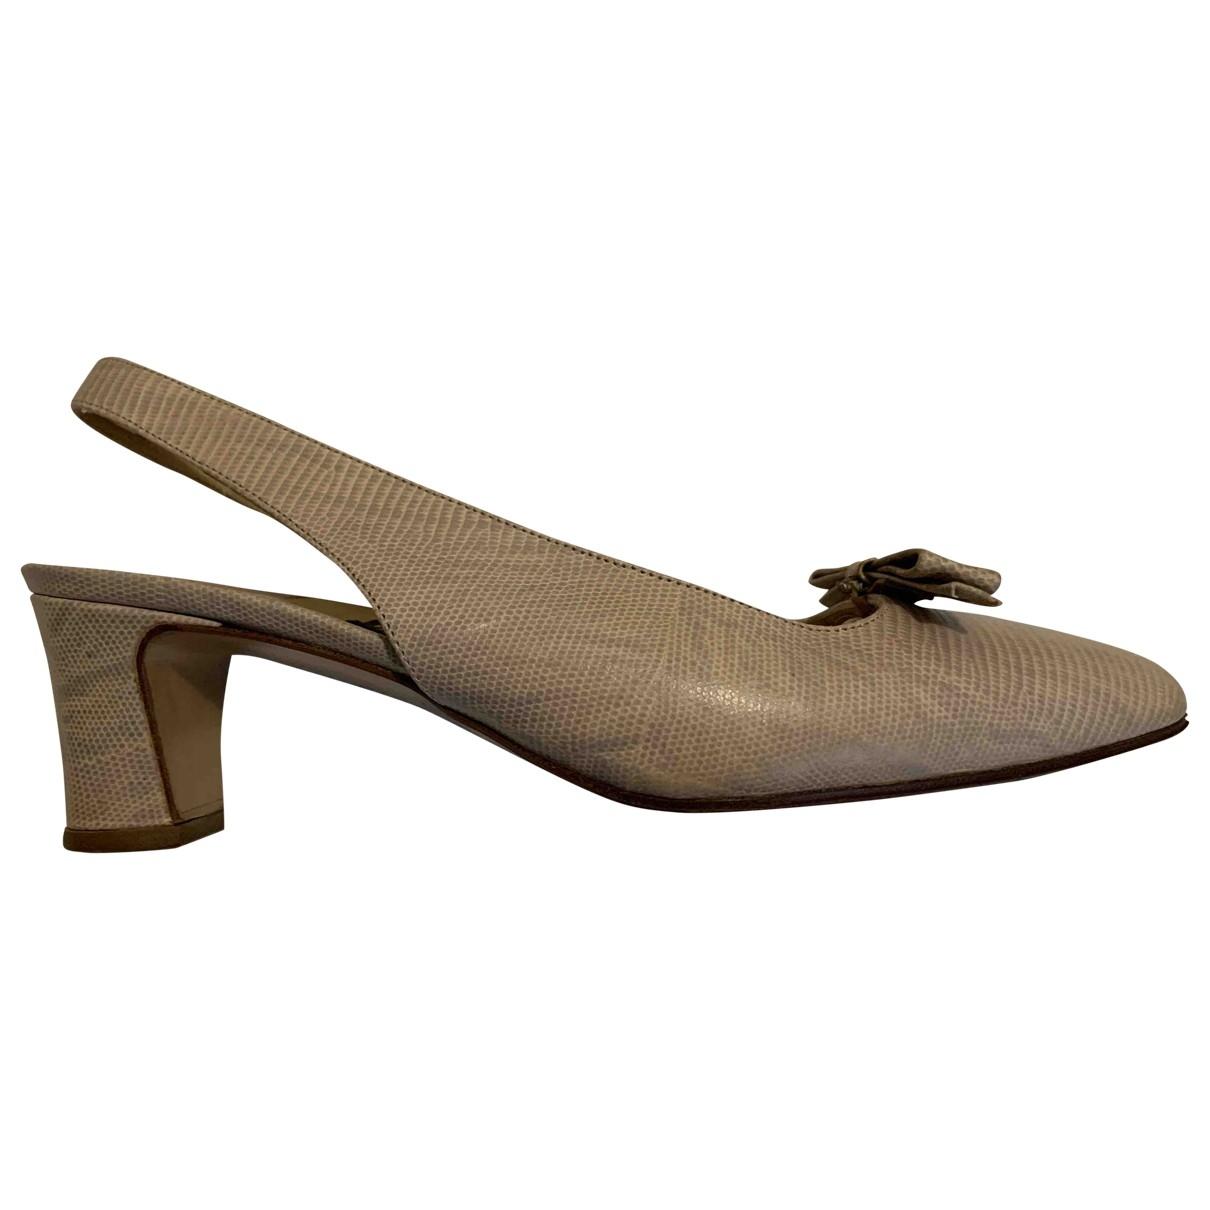 Rena Lange \N Leather Heels for Women 36 EU